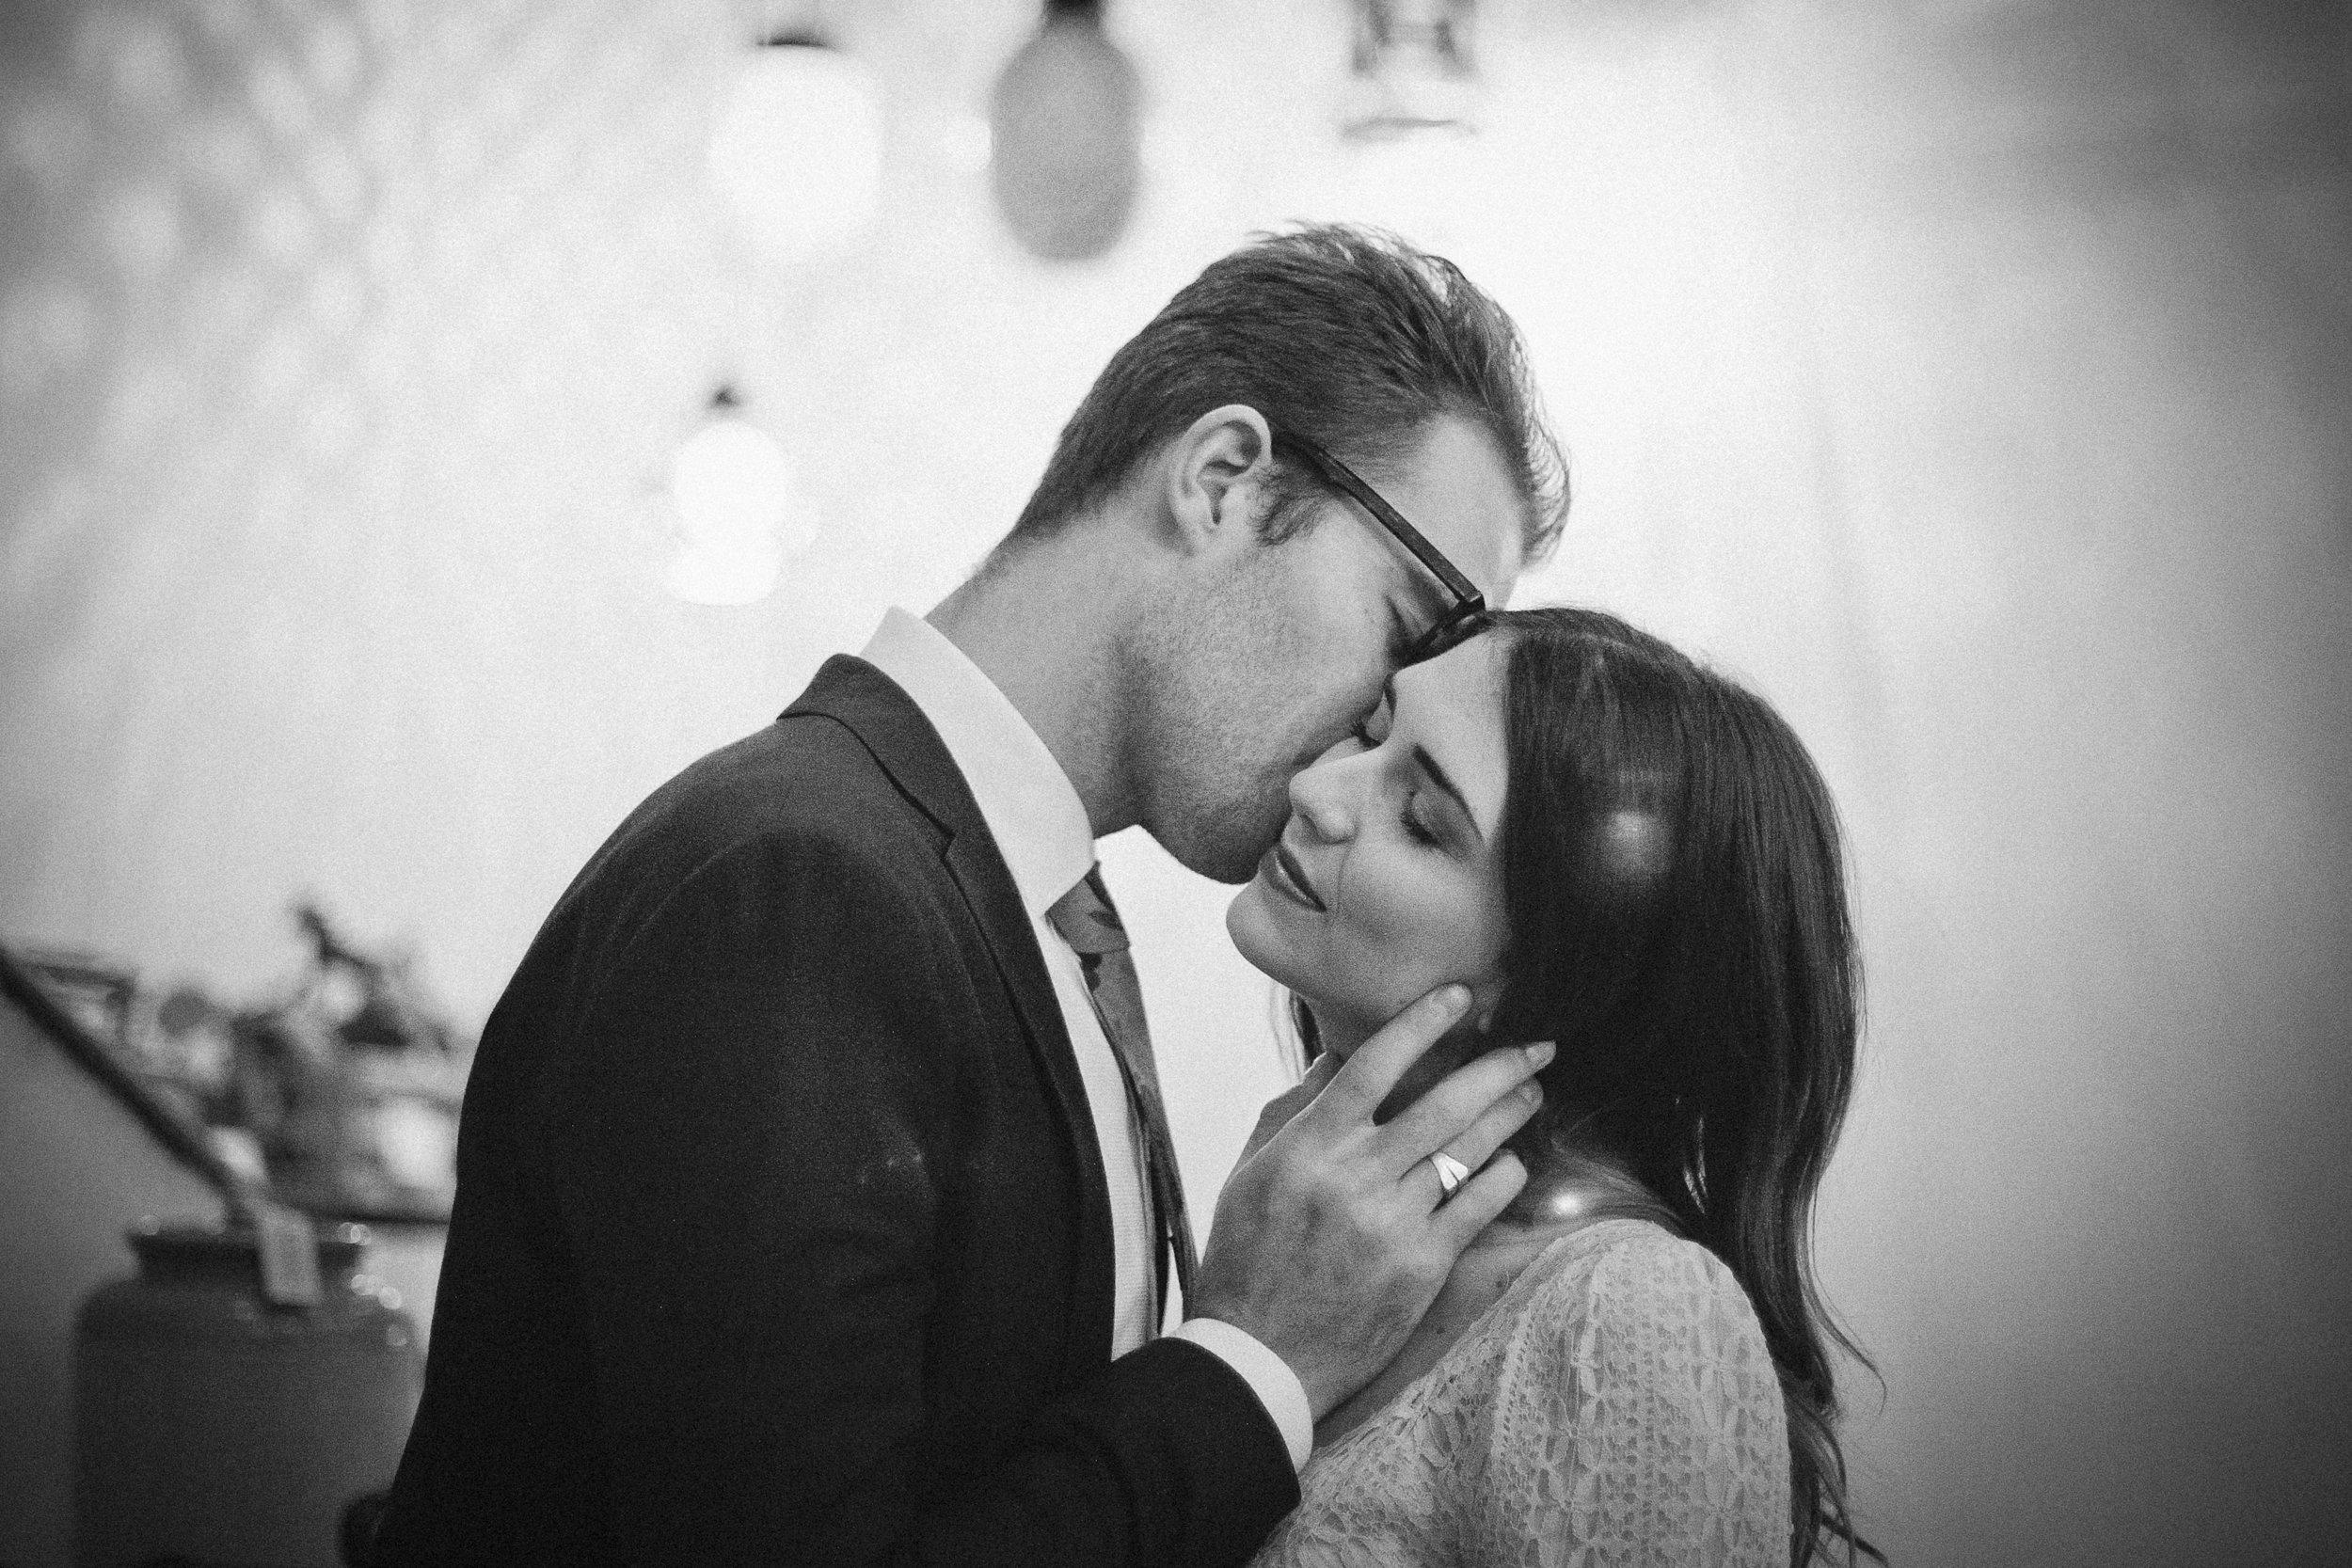 Wedding Photographer Photographers Elopement Travel Destination Romantic Bohemian Lifestyle Candid Creative Traveling Salt Lake Photography Inspiration Seattle Portland